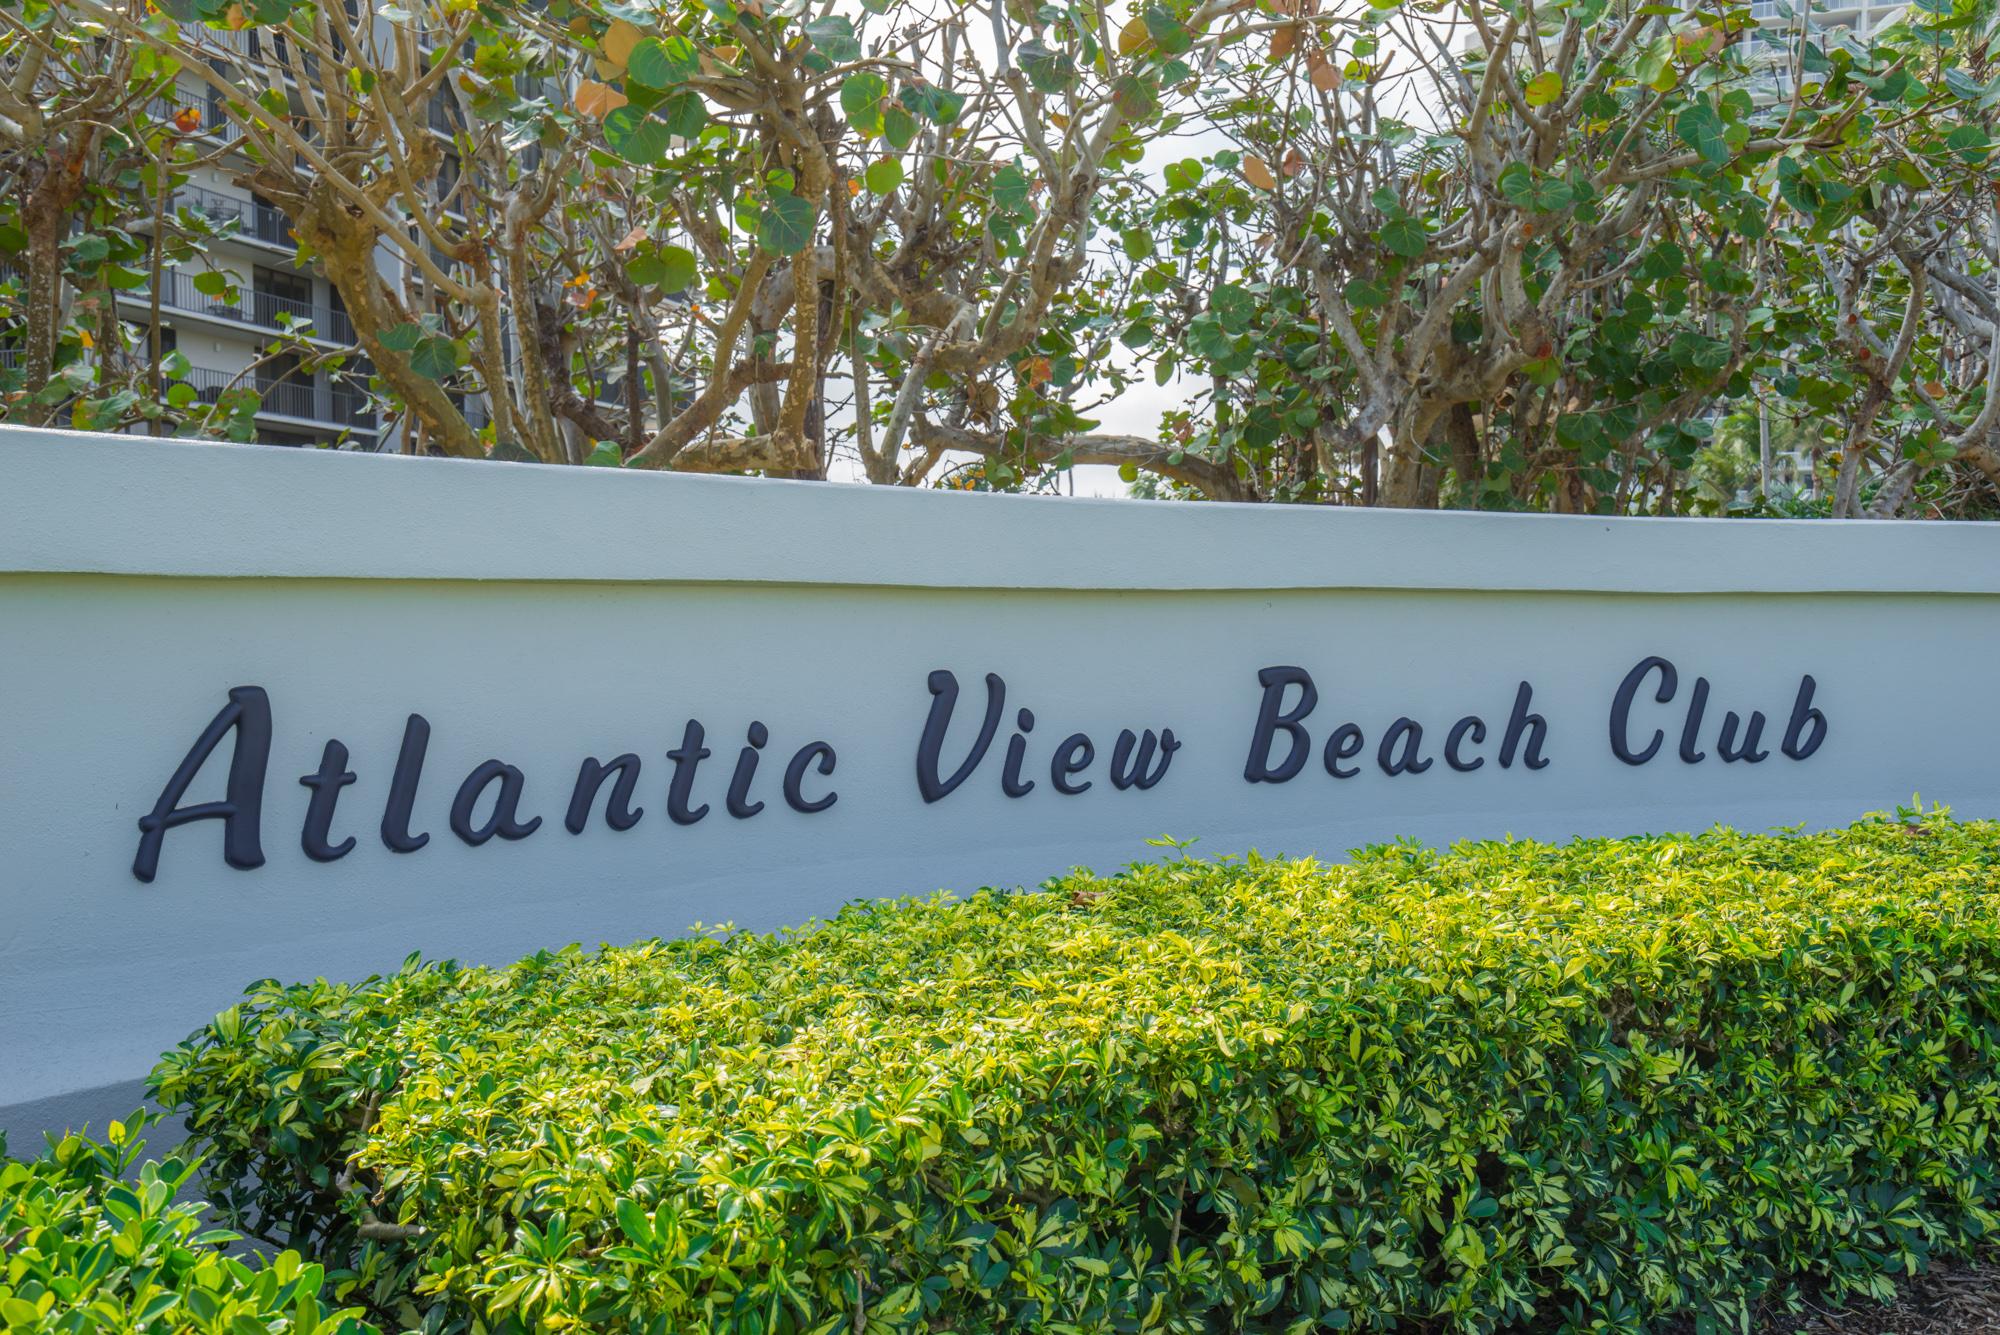 Atlantic View Beach Club - Hutchinson Island - Oceanside Realty Partners